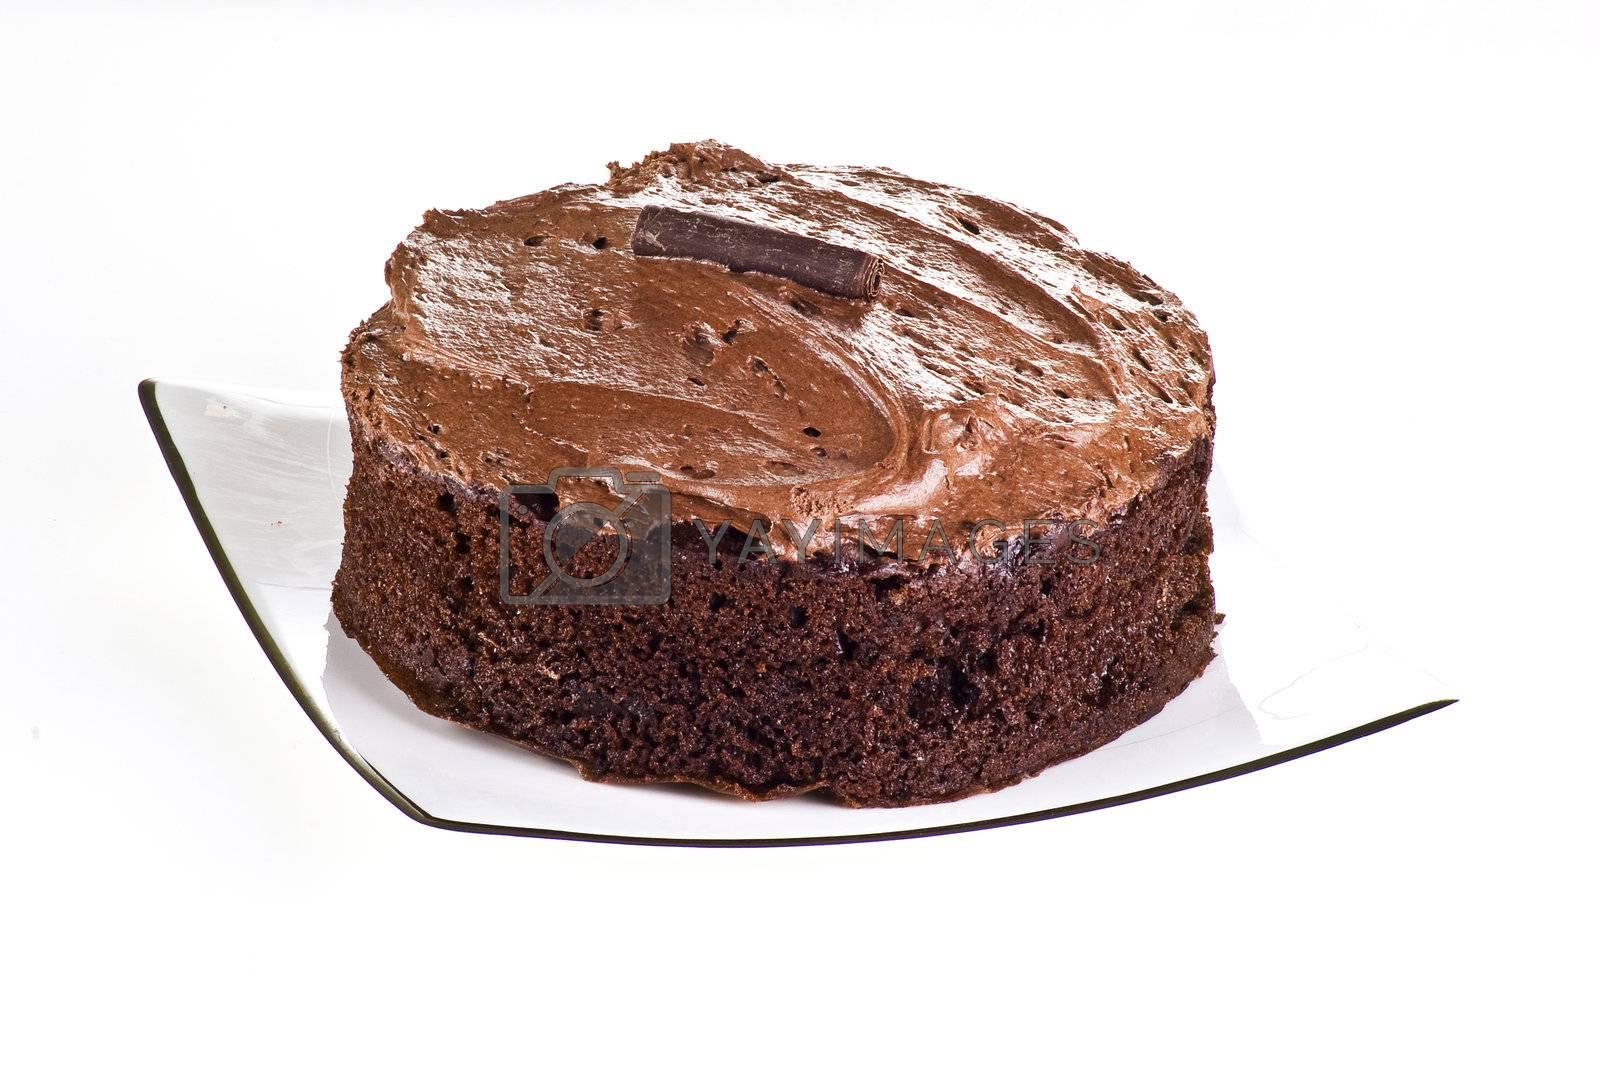 Chocolate cake by caldix